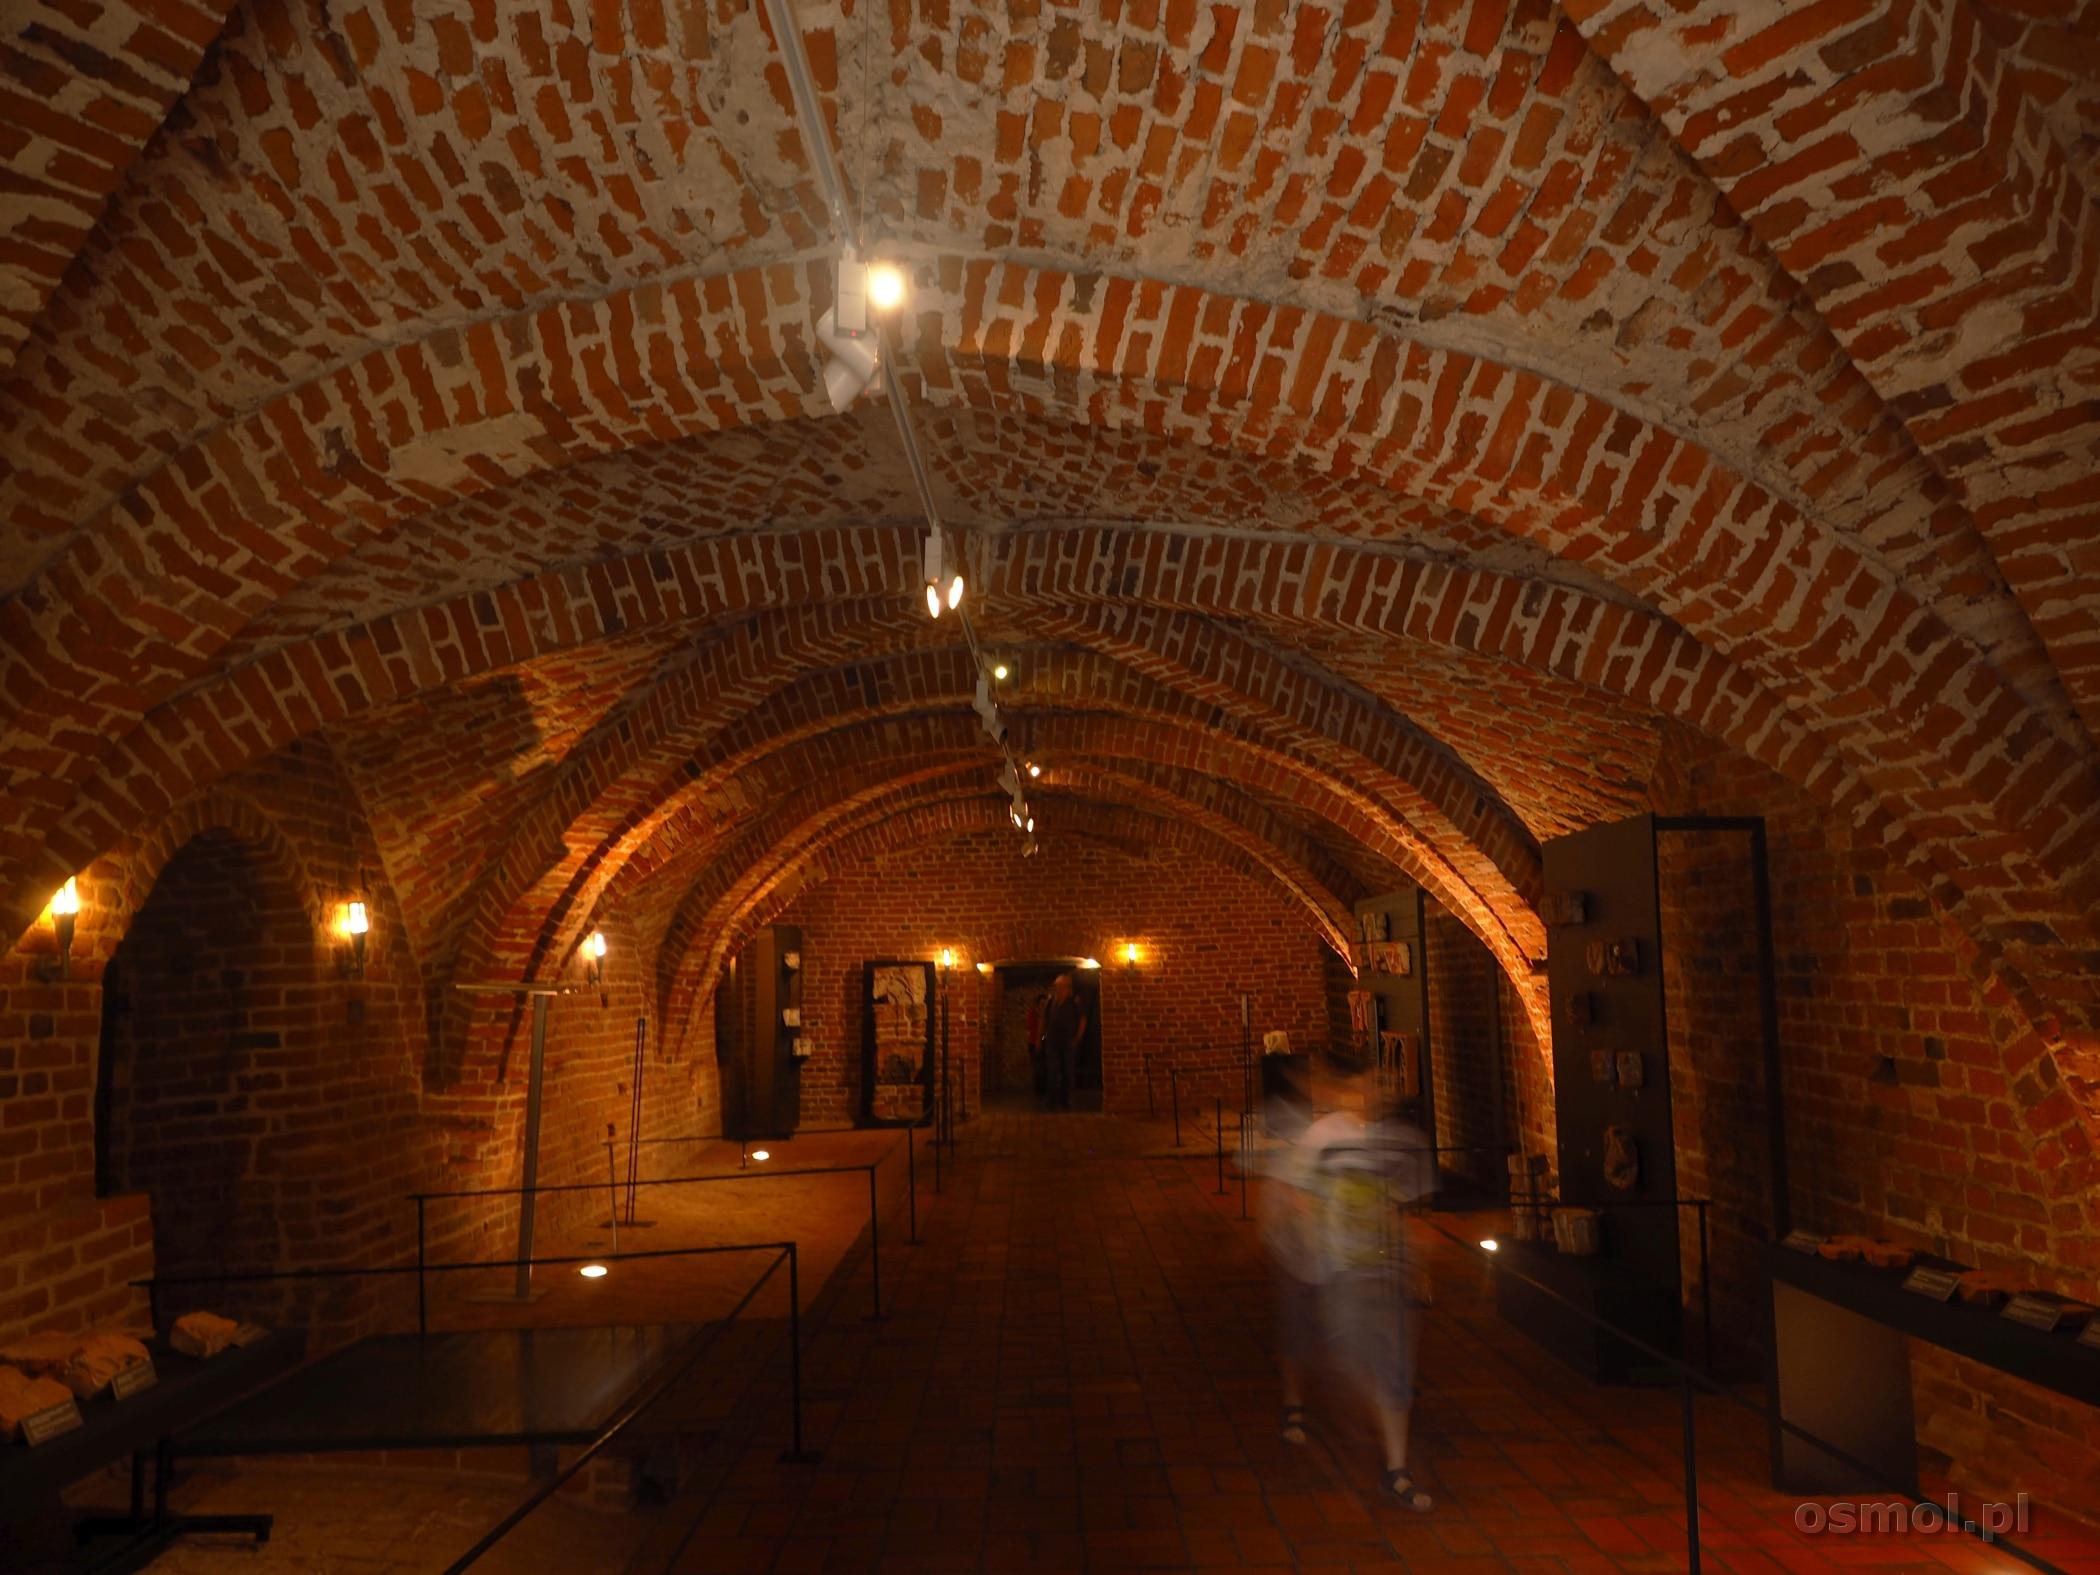 Piwnice zamkowe w Malborku